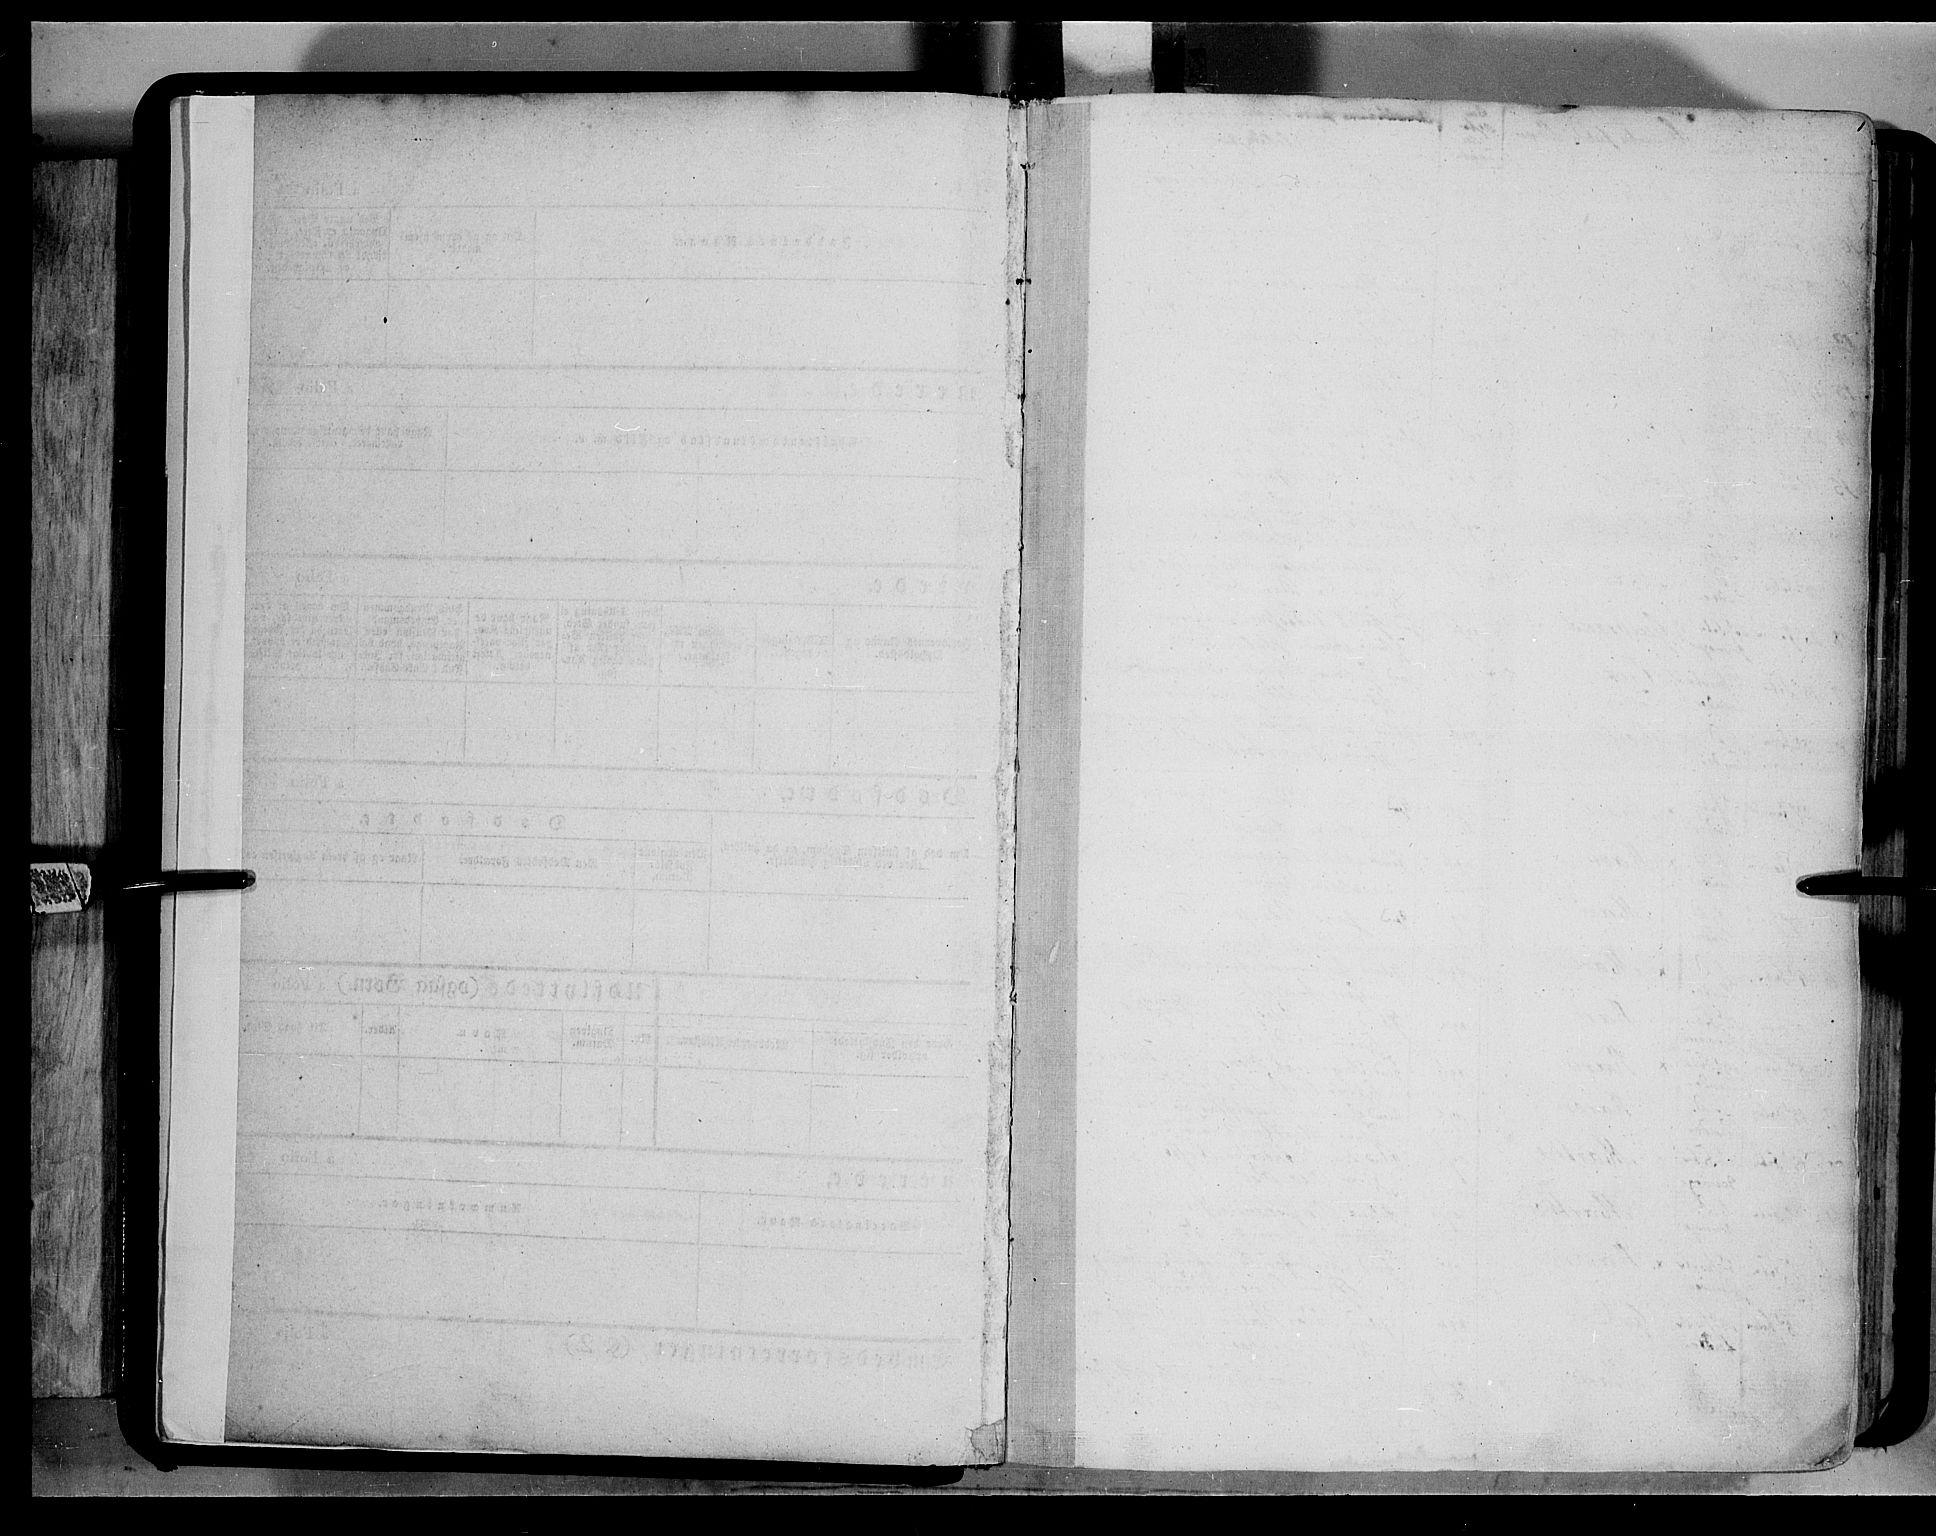 SAH, Jevnaker prestekontor, Ministerialbok nr. 6, 1837-1857, s. 1